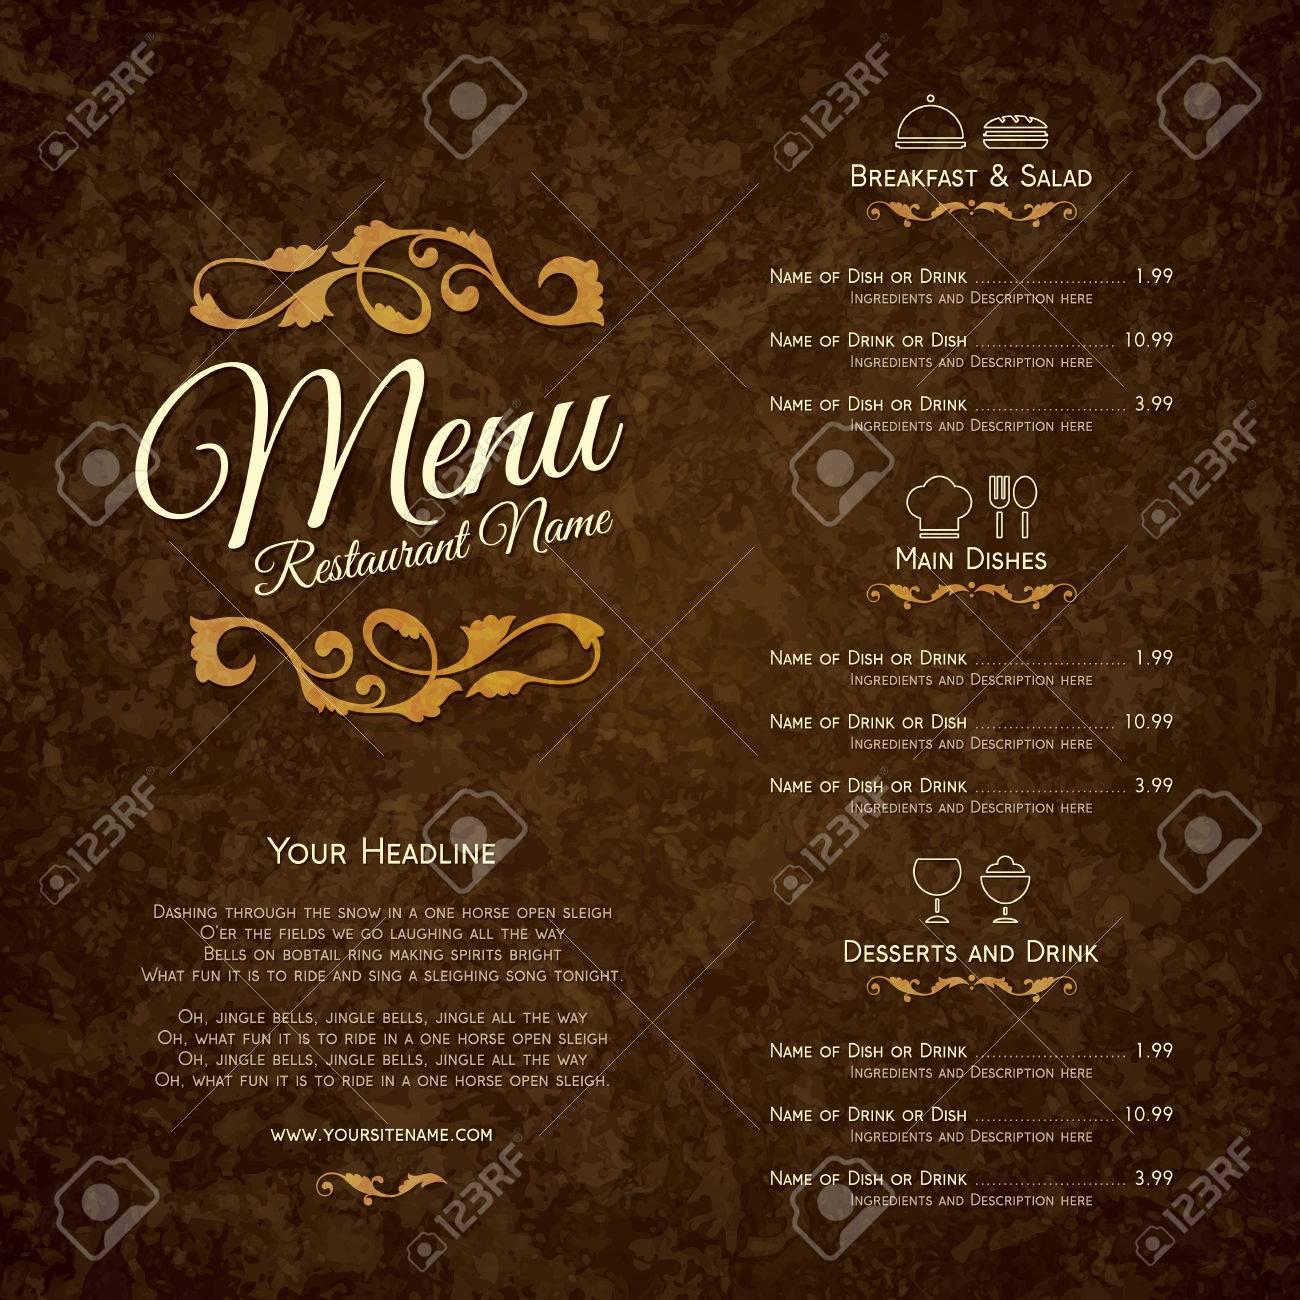 Restaurant menu design - 54504823